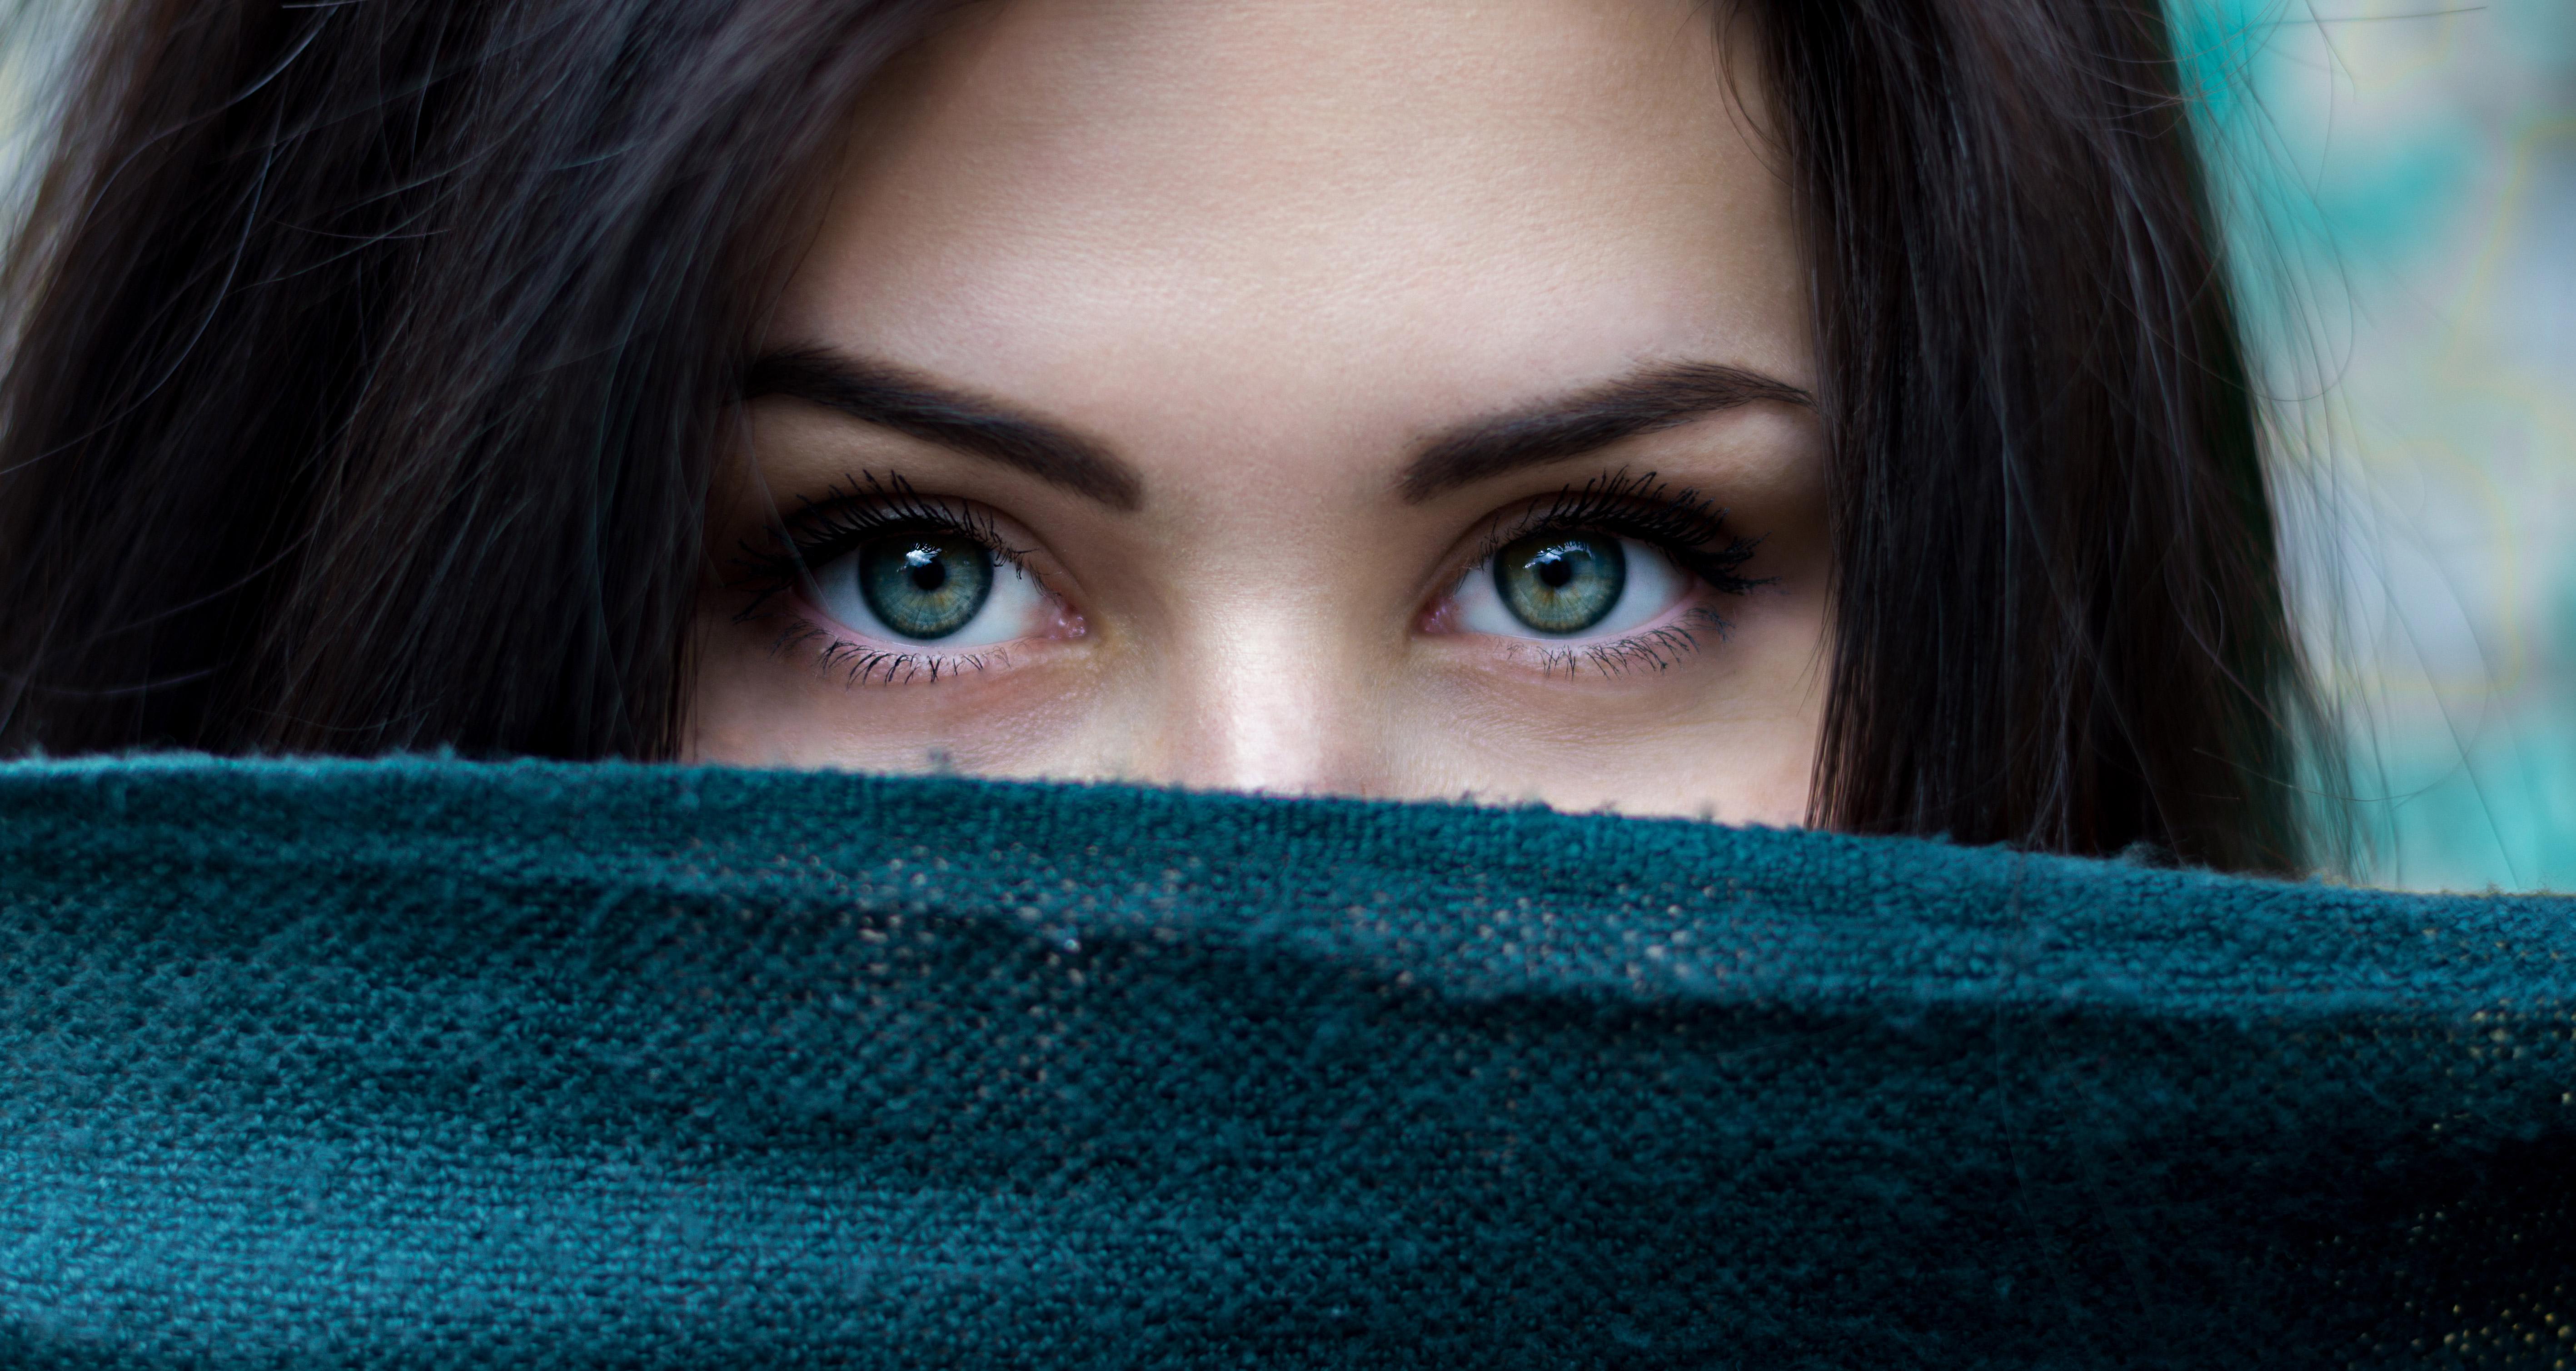 green eyes girl hd girls 4k wallpapers images